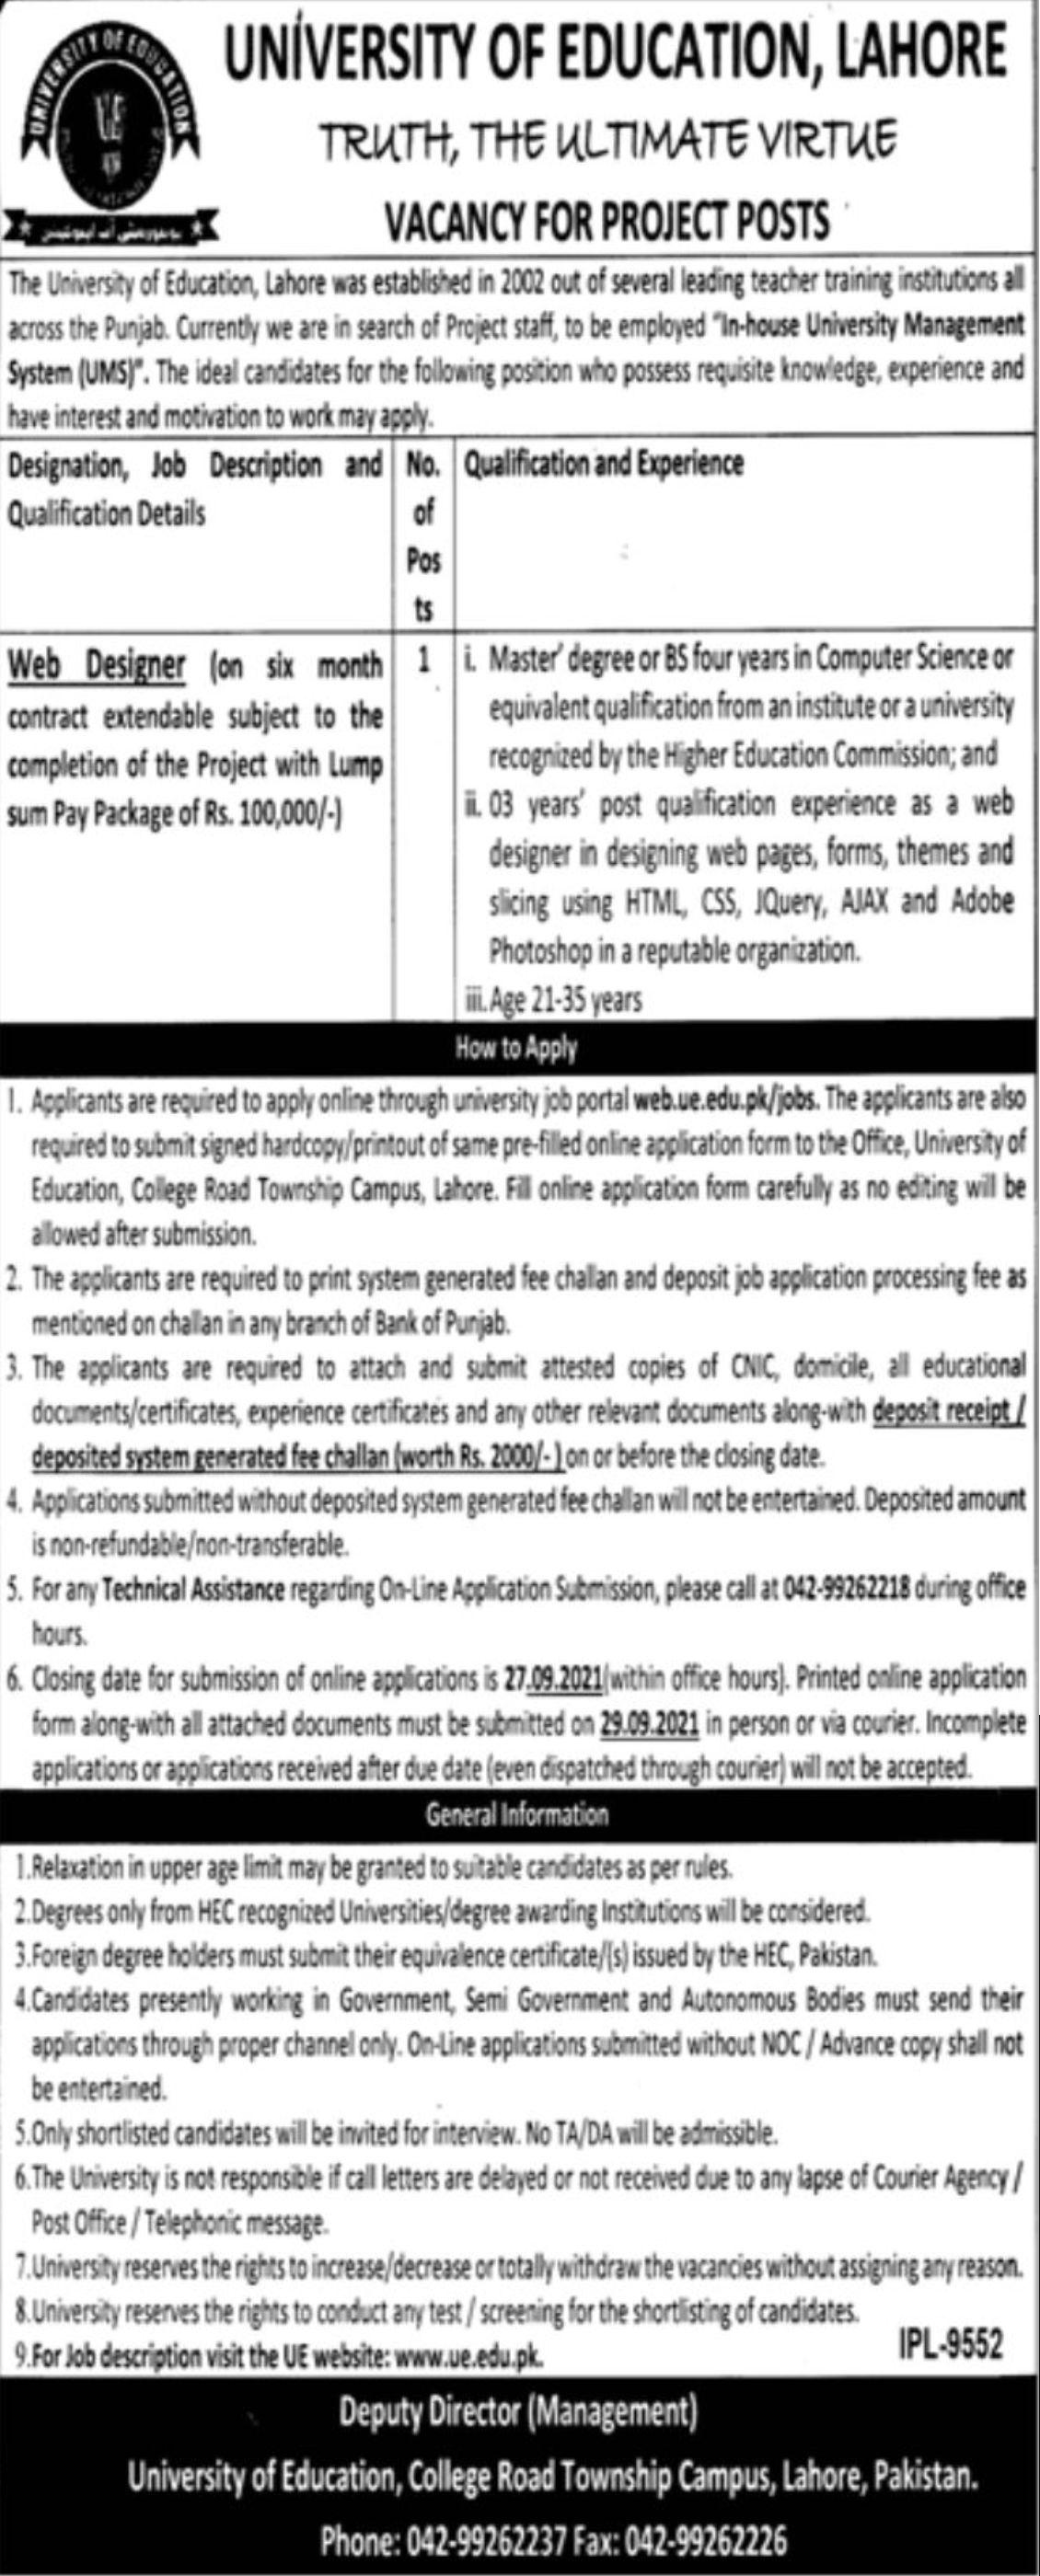 University of Education Lahore Vacancies 2021 – Dailyjobs.pk 3